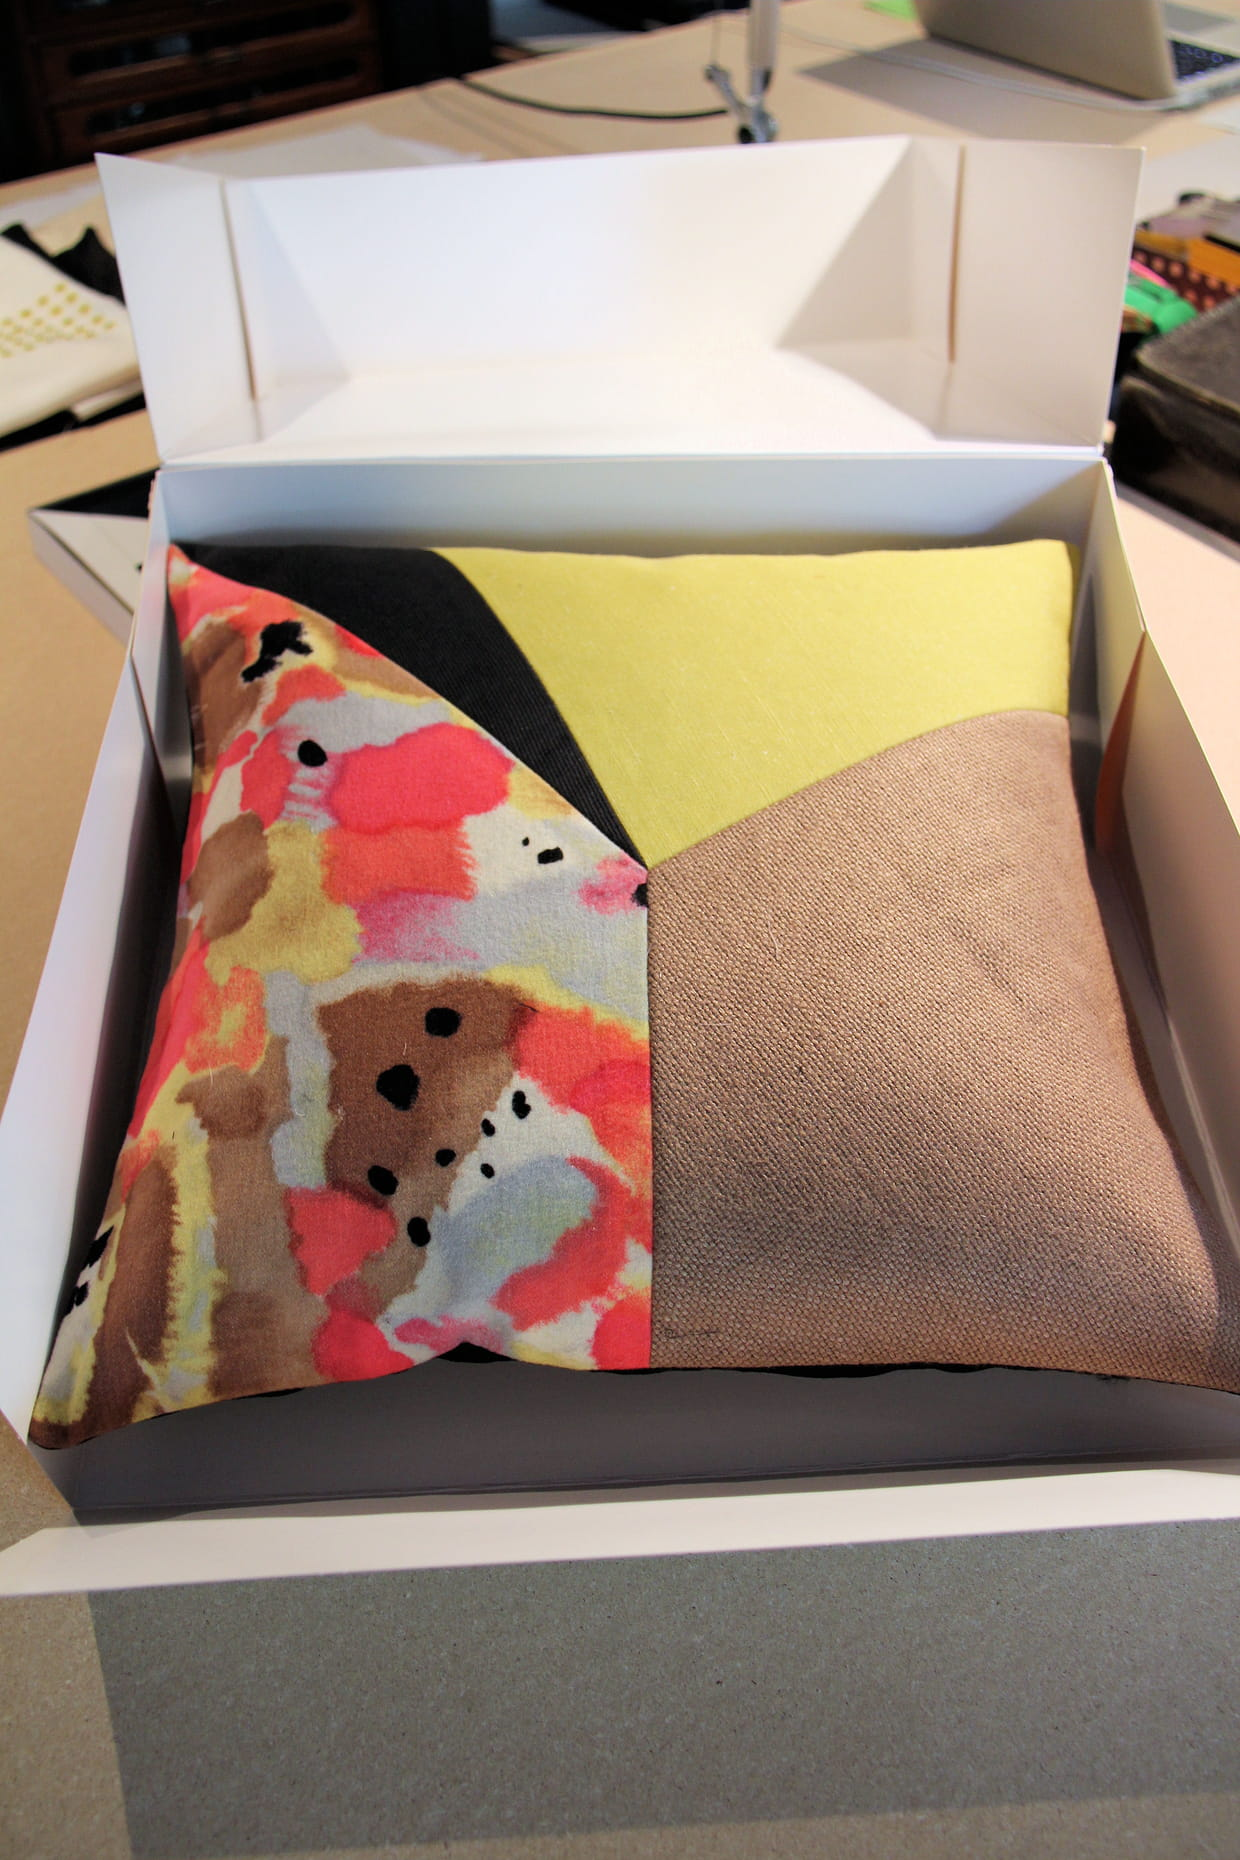 coussin arty collection figure de style. Black Bedroom Furniture Sets. Home Design Ideas